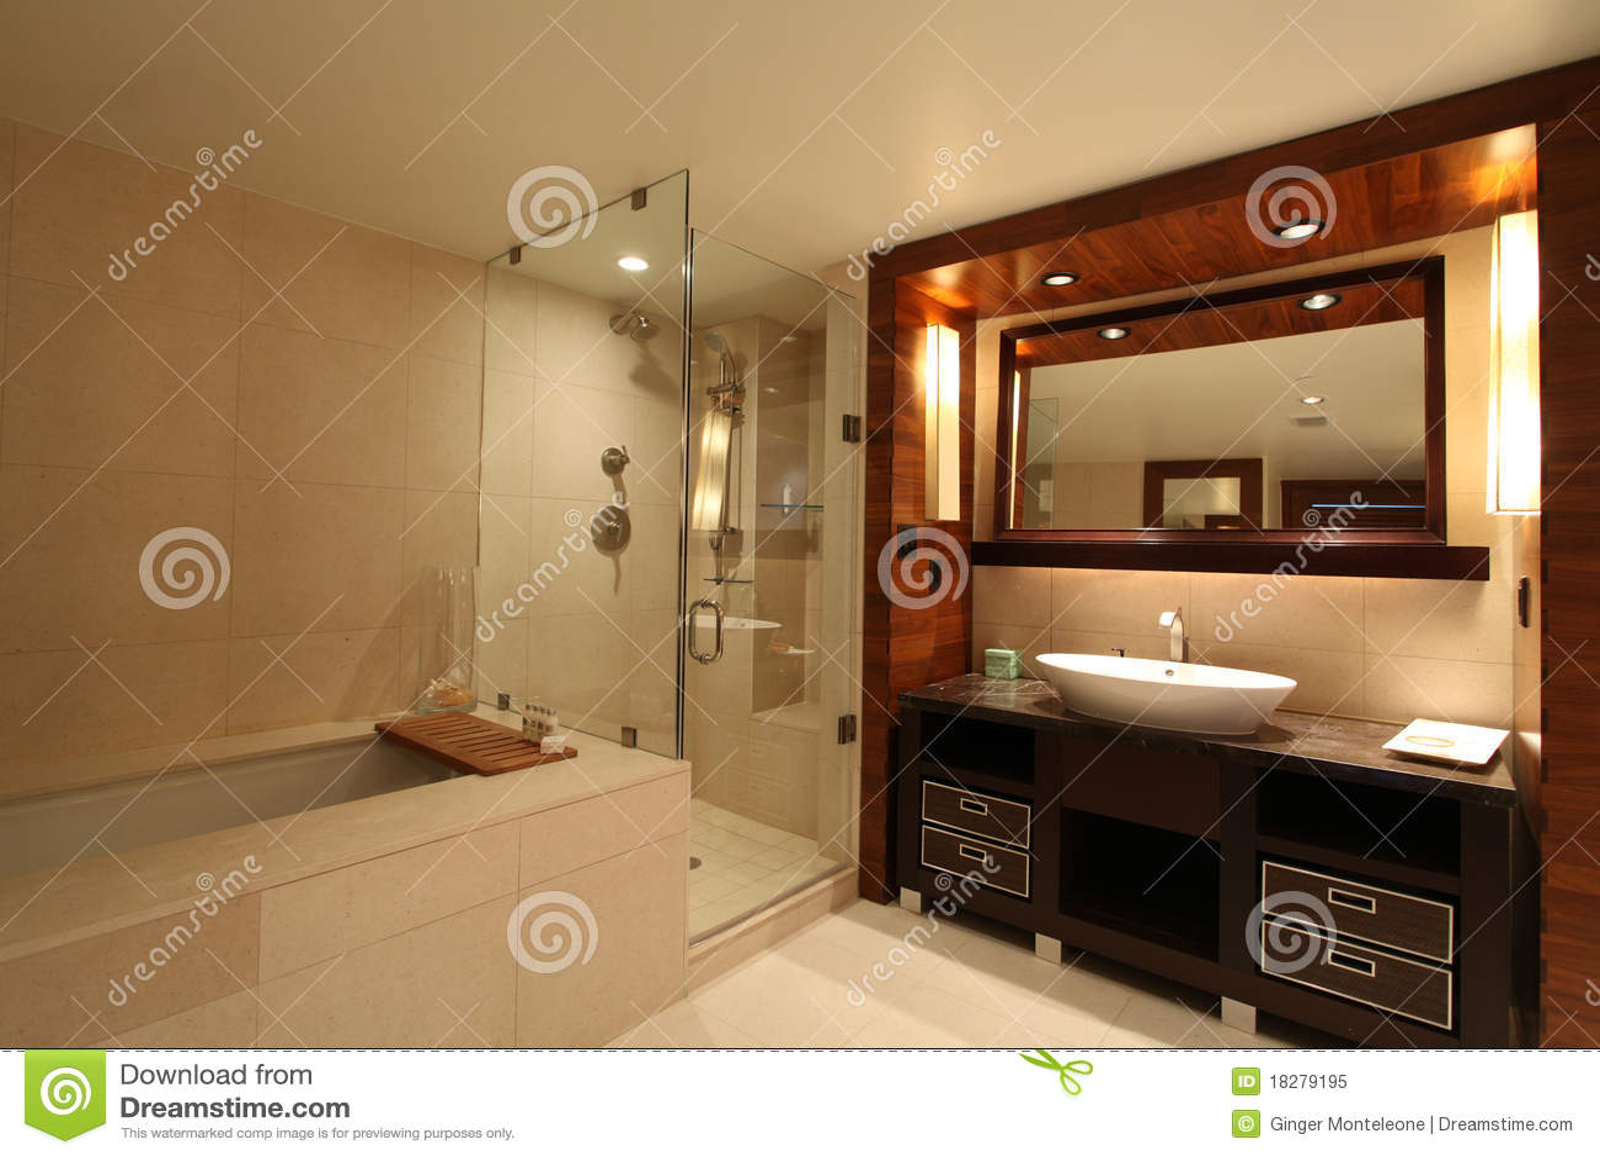 Iluminacion Cuarto Baño:Modern Romantic Bathroom